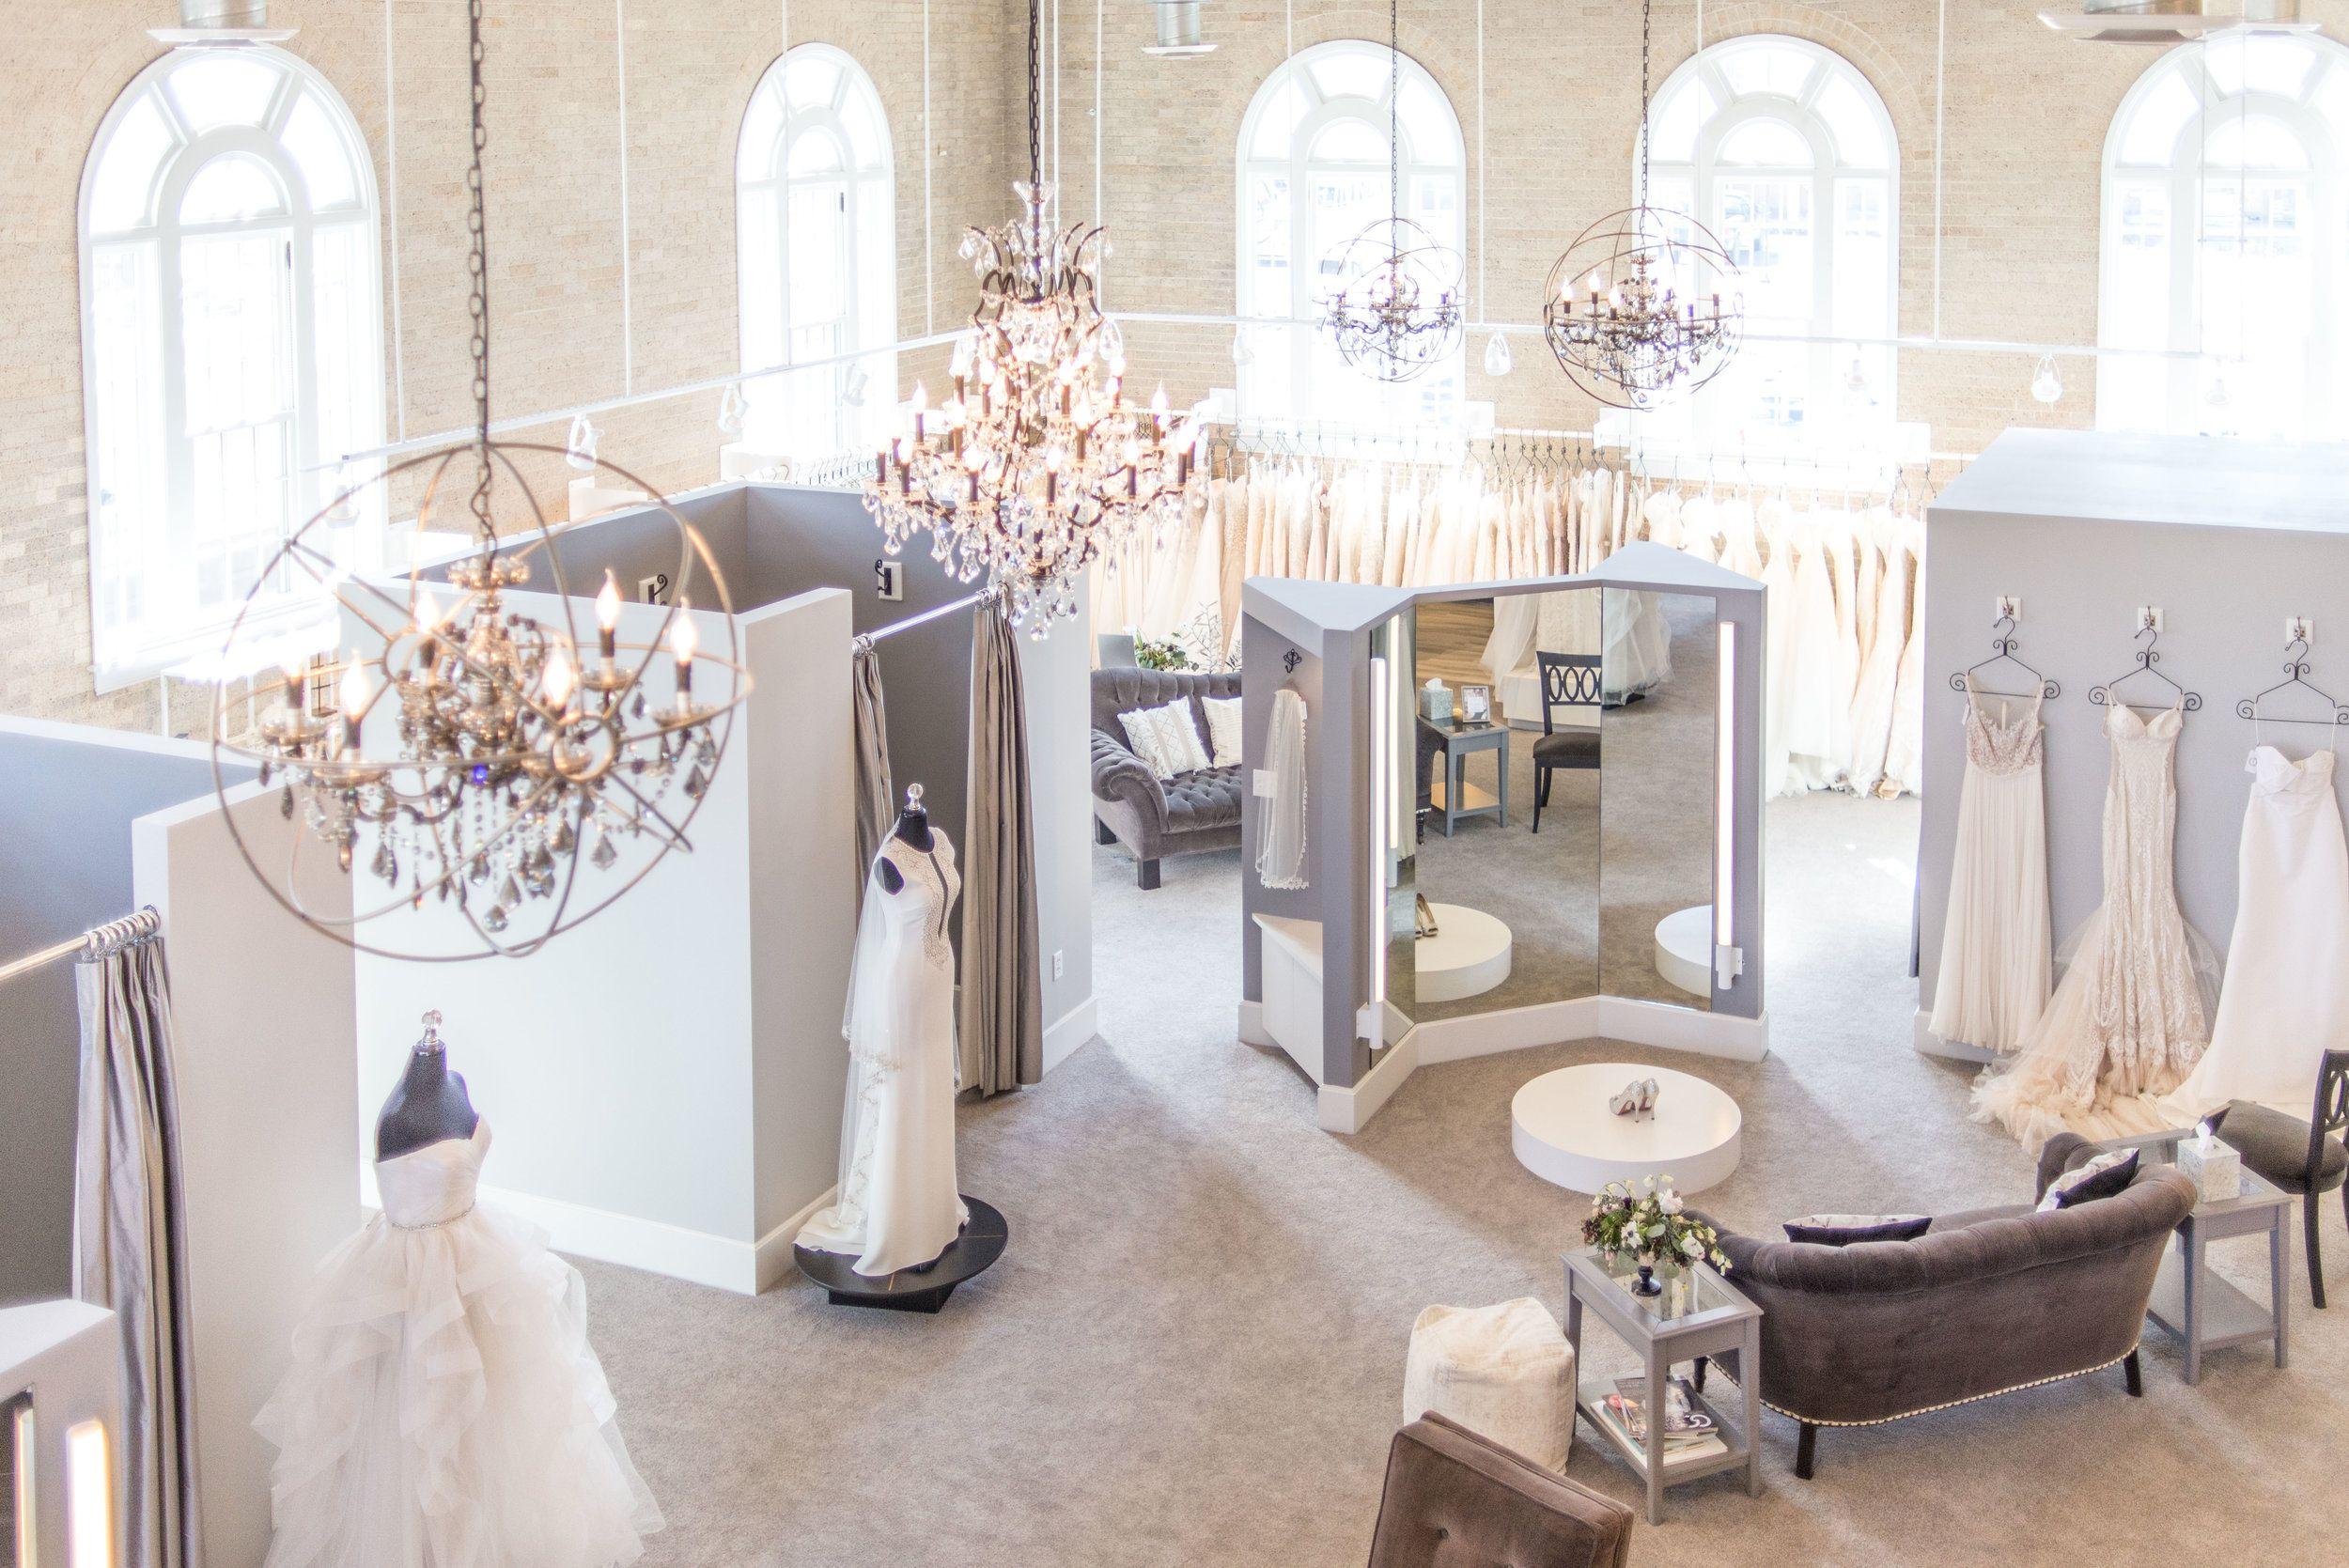 Little White Dress Bridal Shop   Denver, Colorado's Best Designer Wedding Dresses and Accessories #bridalshops